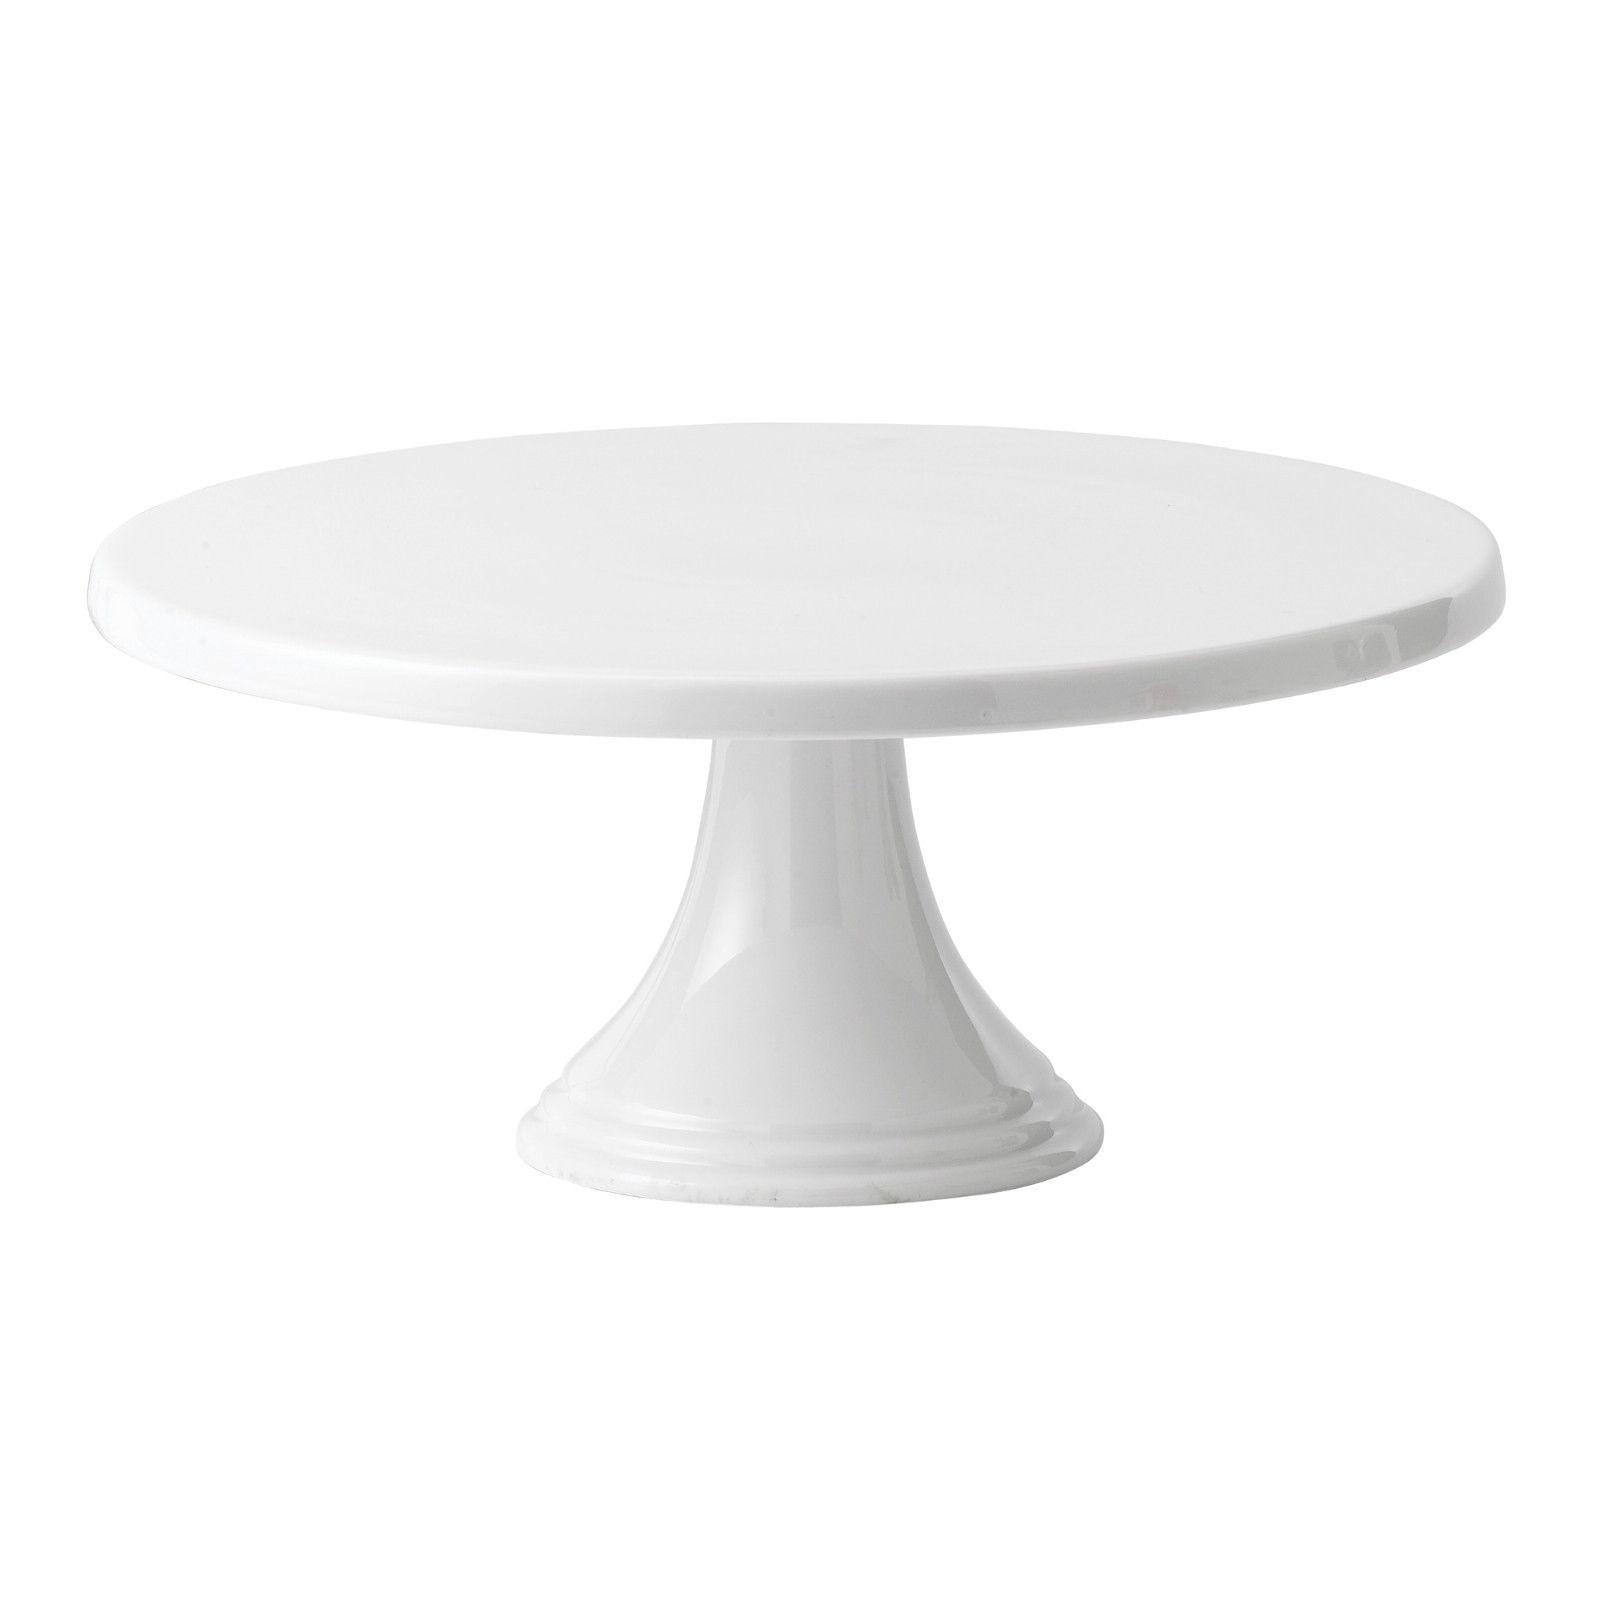 White Cake Stand  White cake stand deals on 1001 Blocks